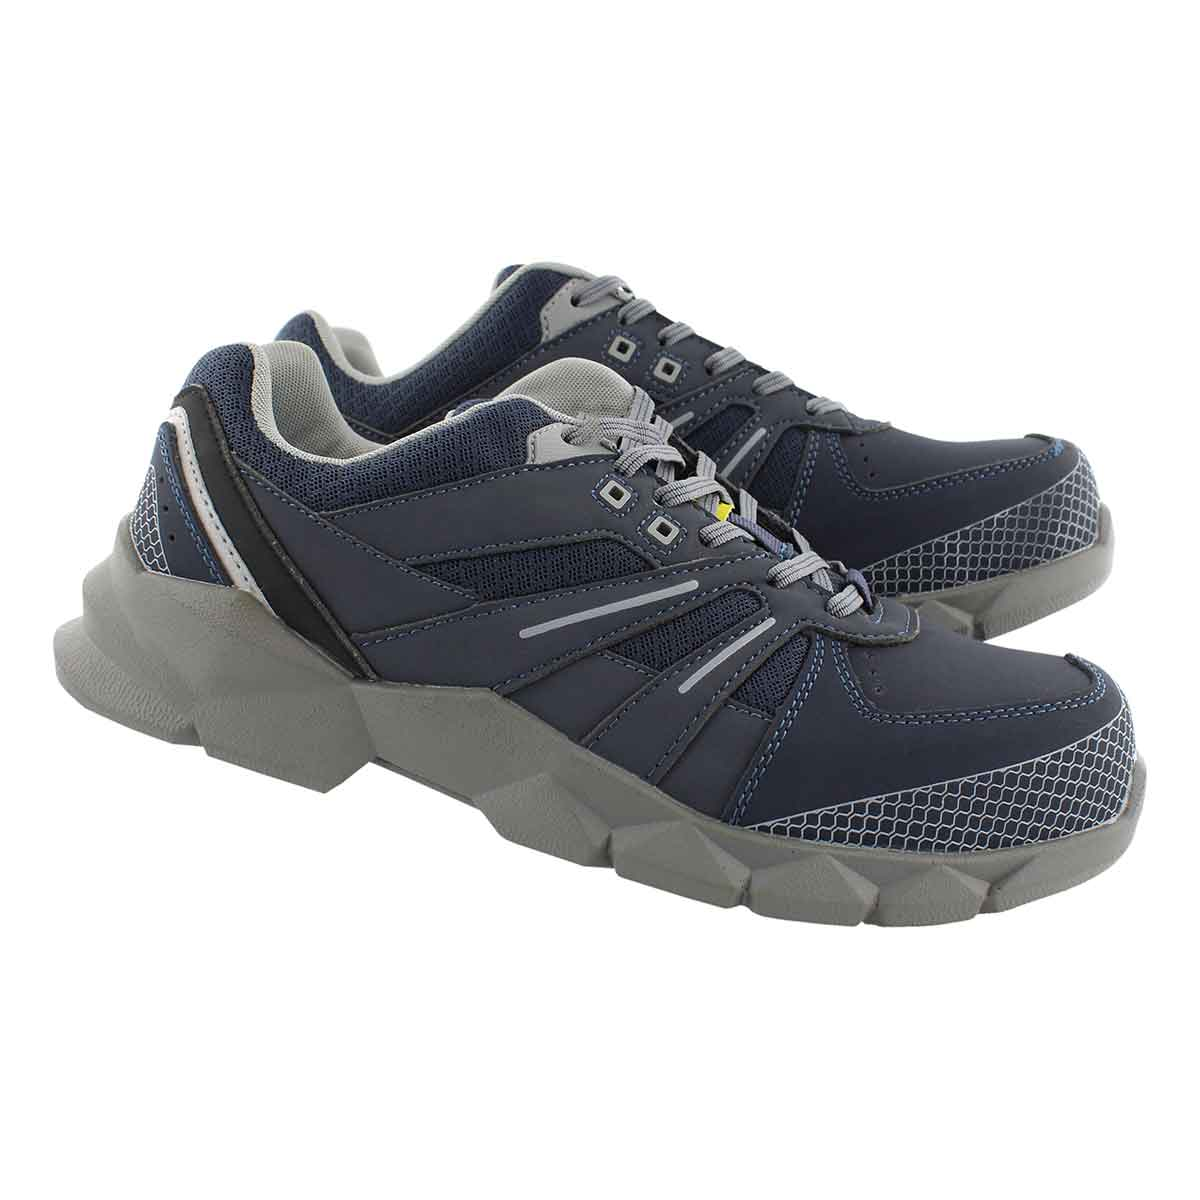 Mns Rook & Rook blue CSA shoe